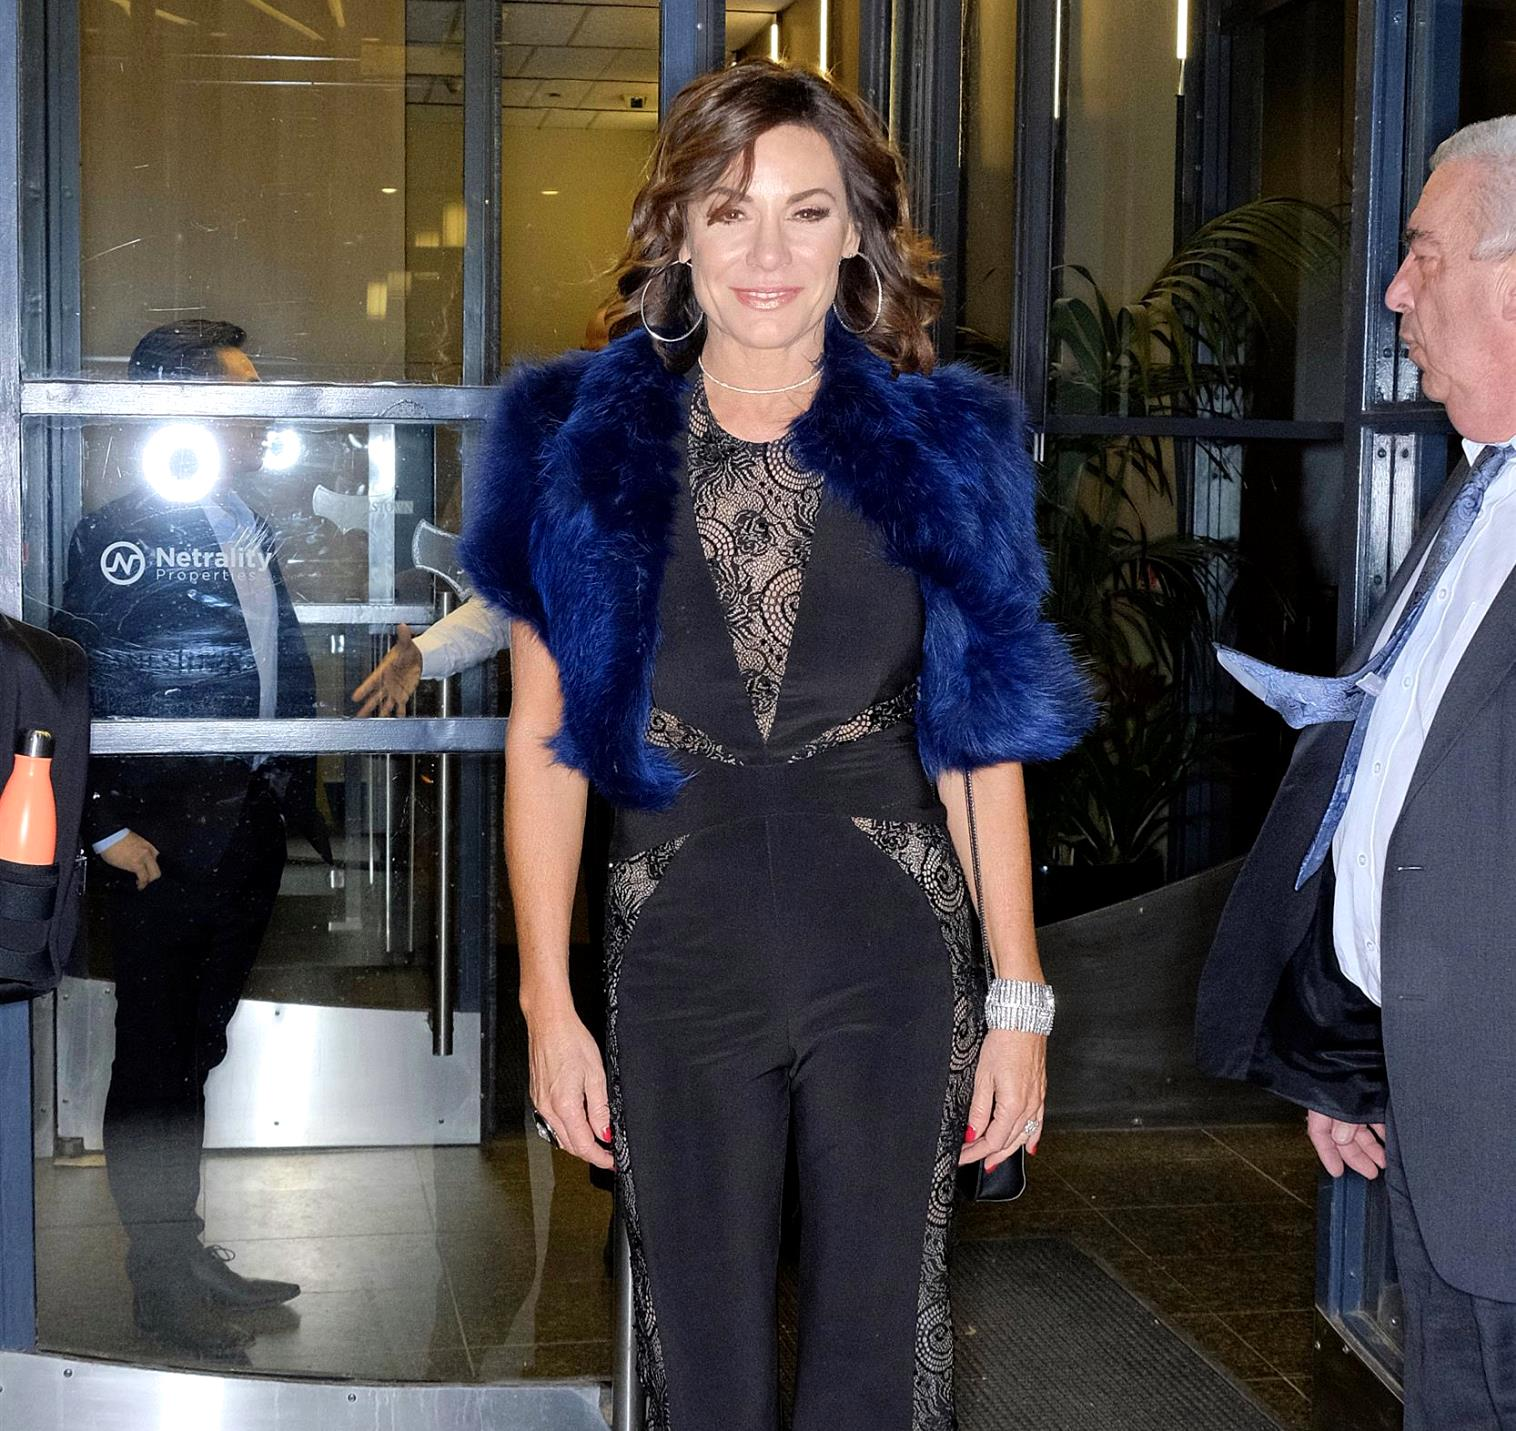 RHONY's Luann de Lesseps Leaves Rehab